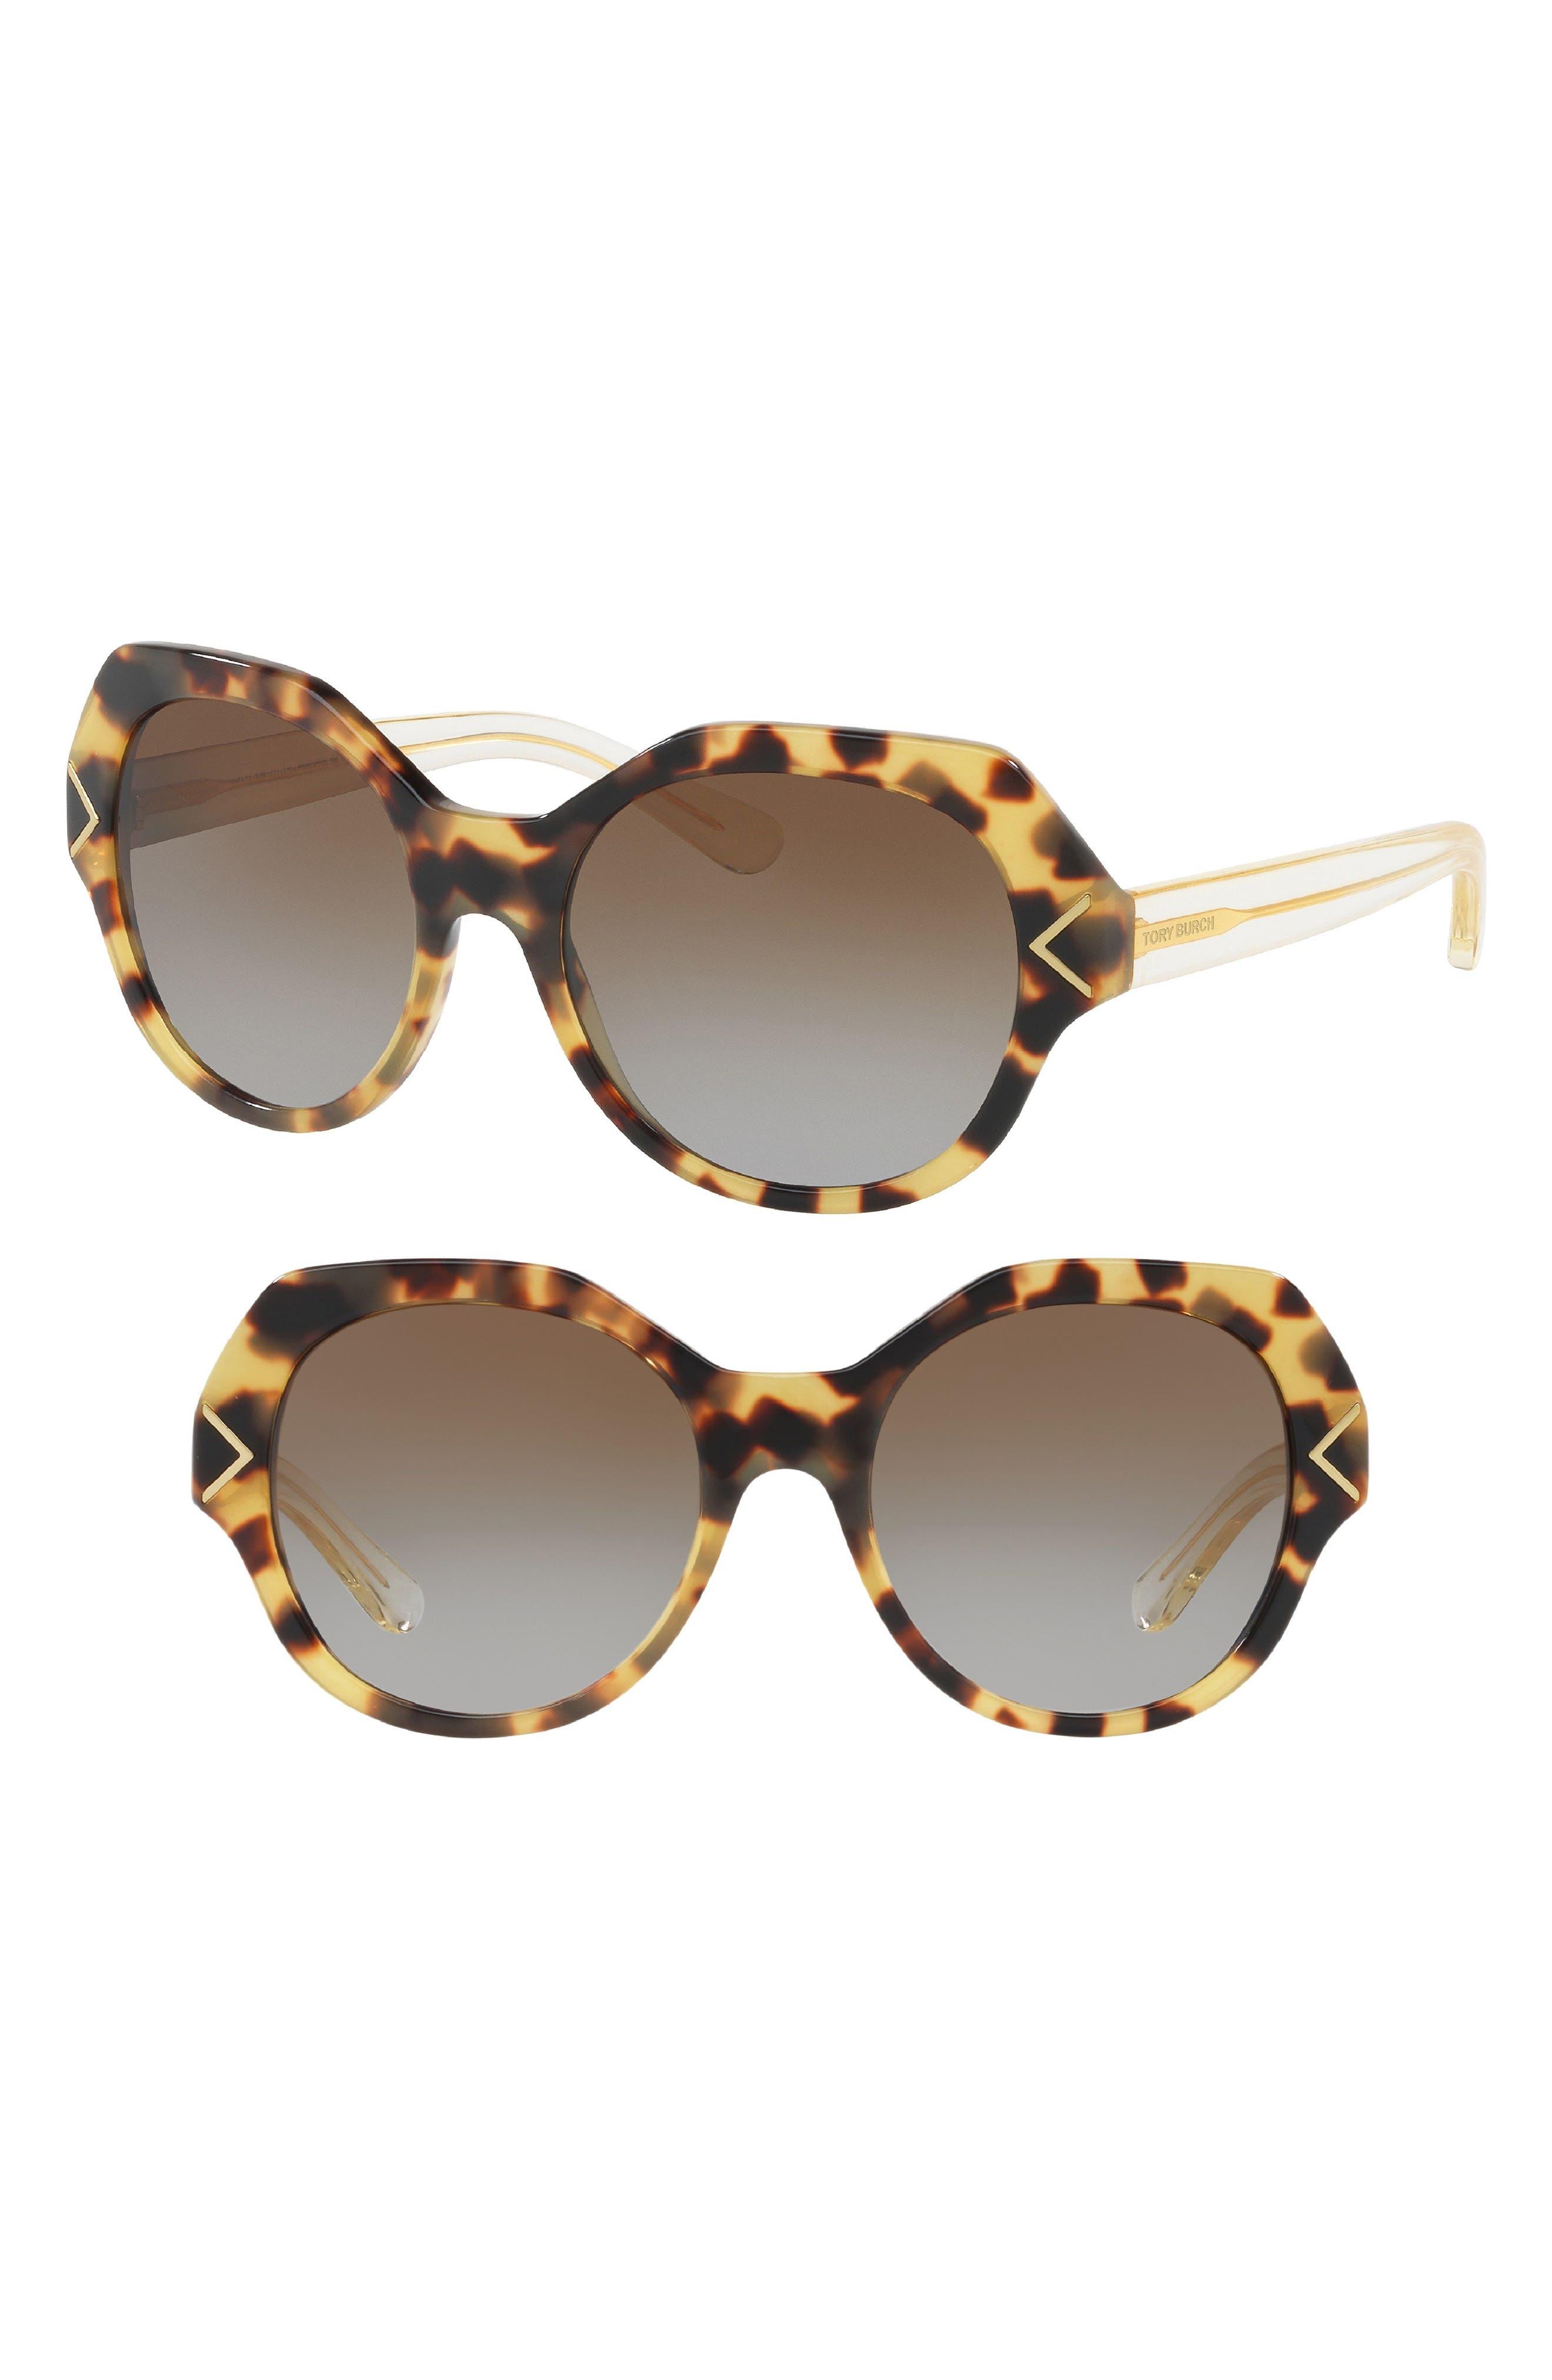 53mm Polarized Gradient Geometric Sunglasses,                             Alternate thumbnail 3, color,